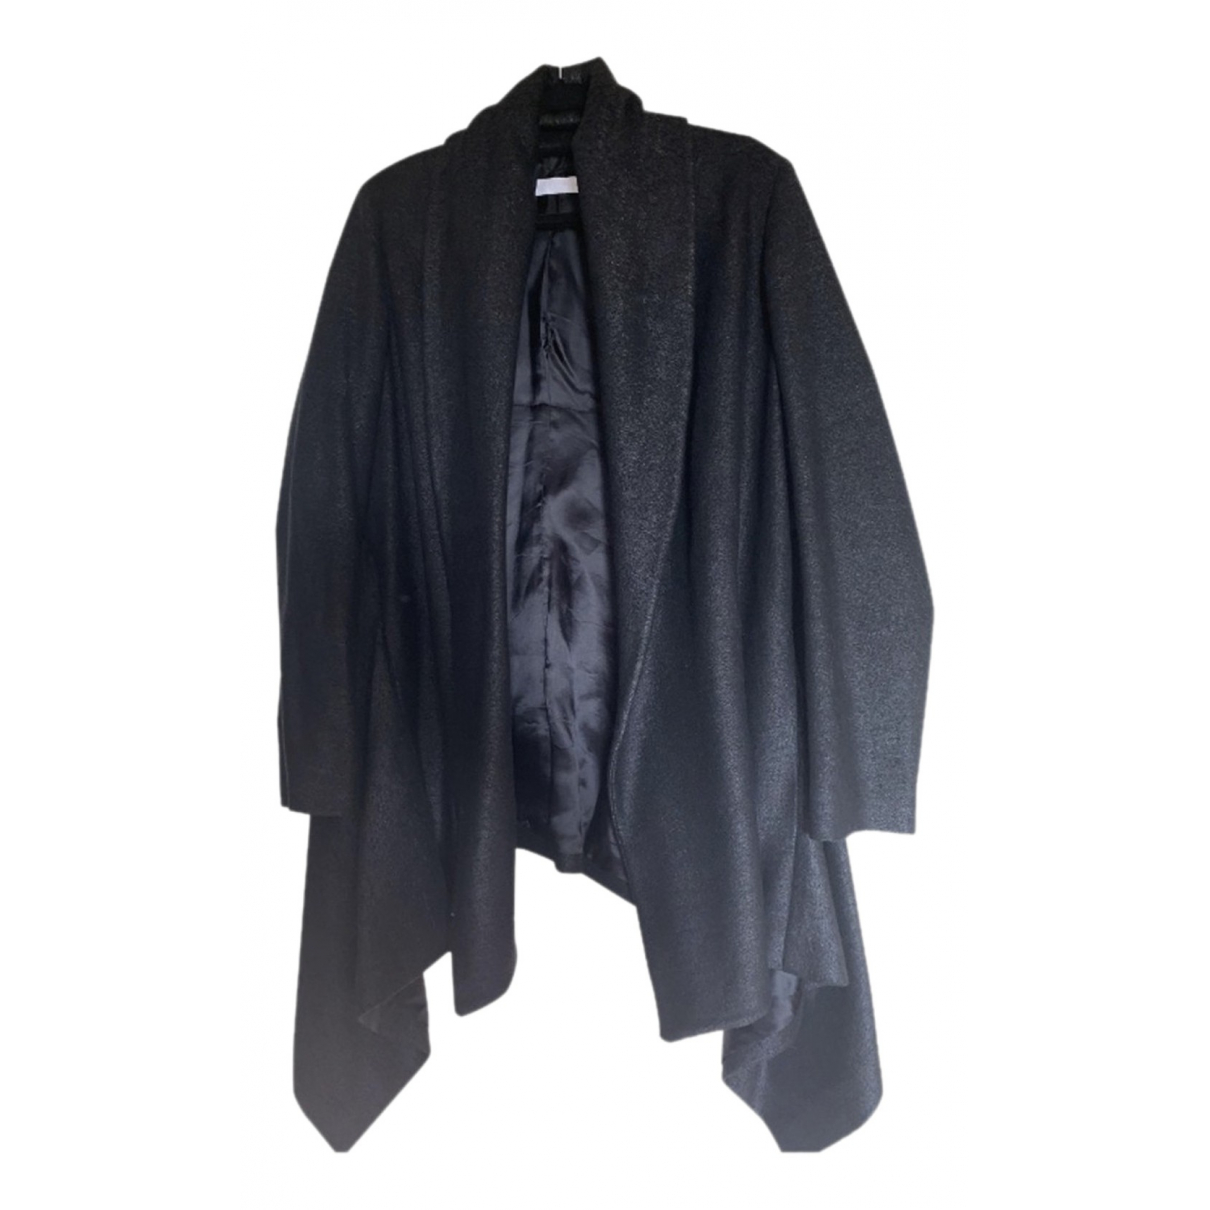 Nicole Farhi \N Black Cotton jacket for Women S International